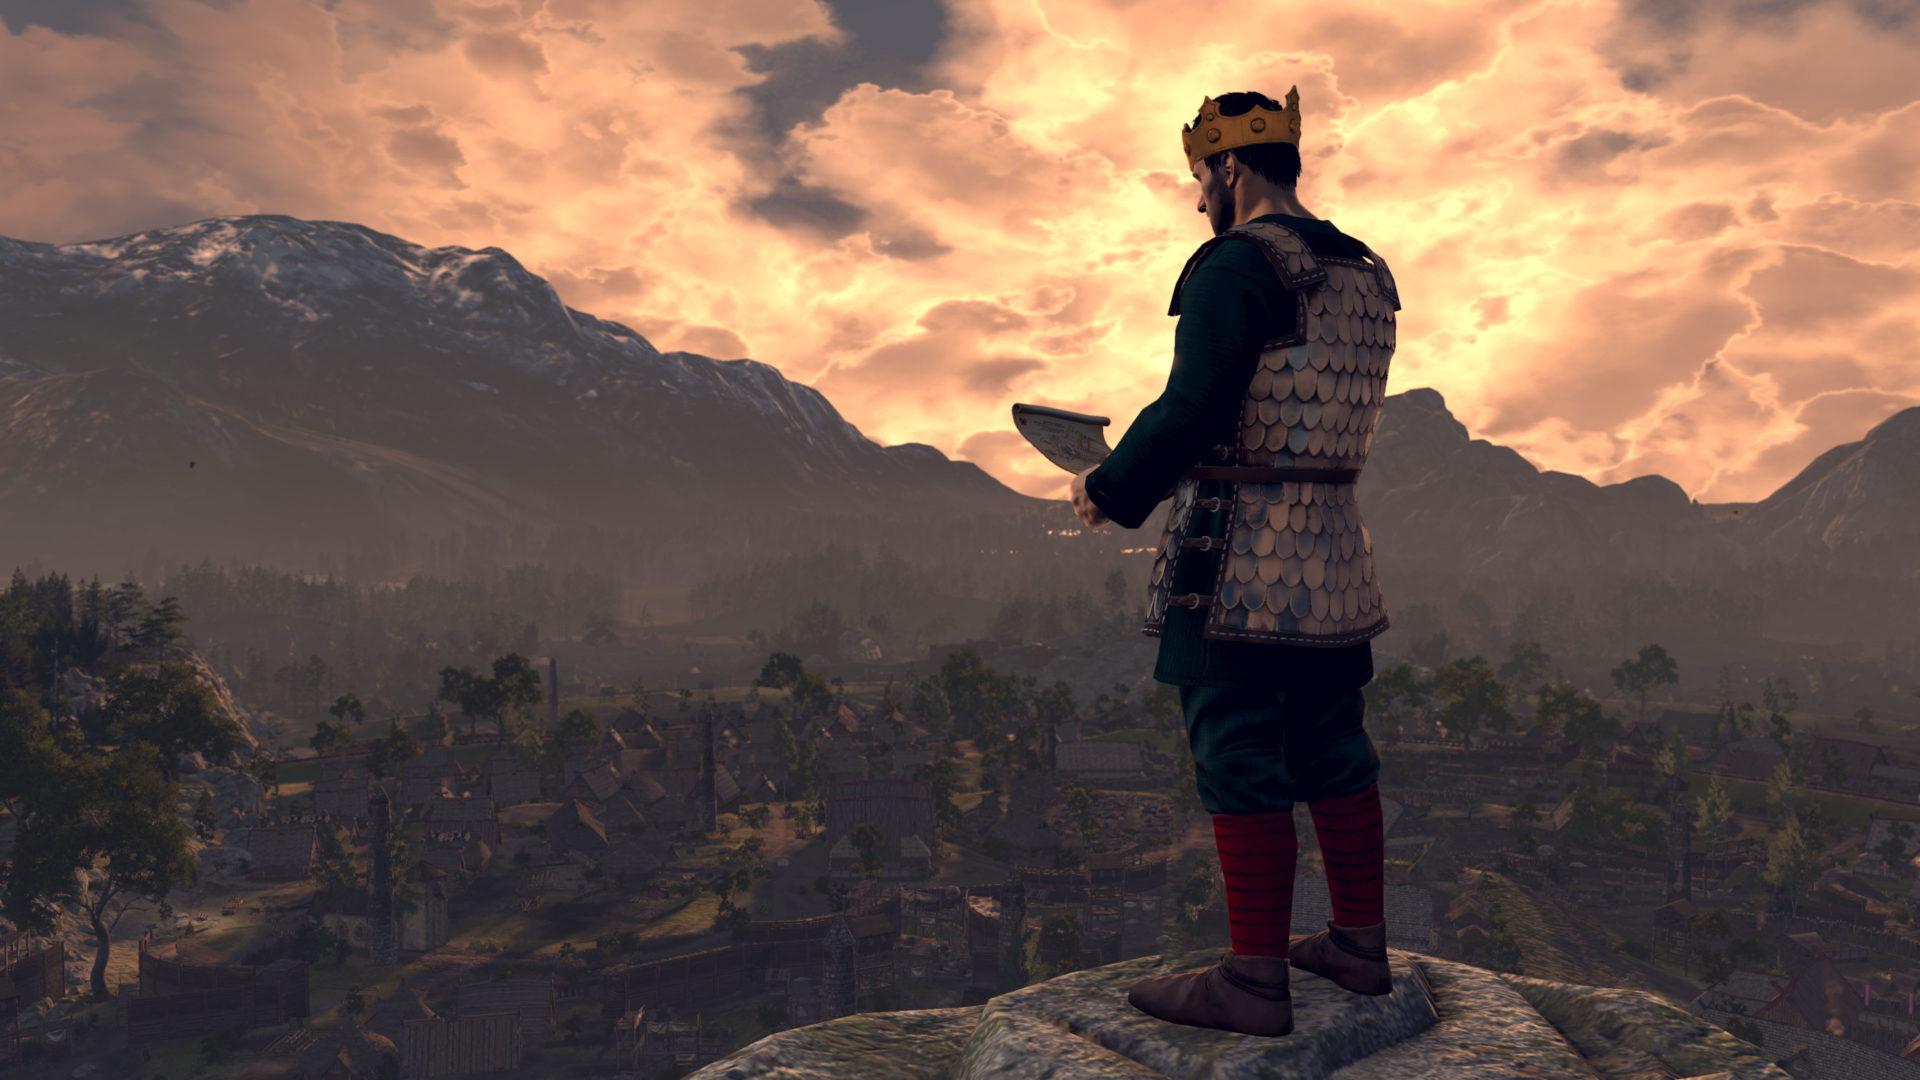 King Anaraut surveying his town